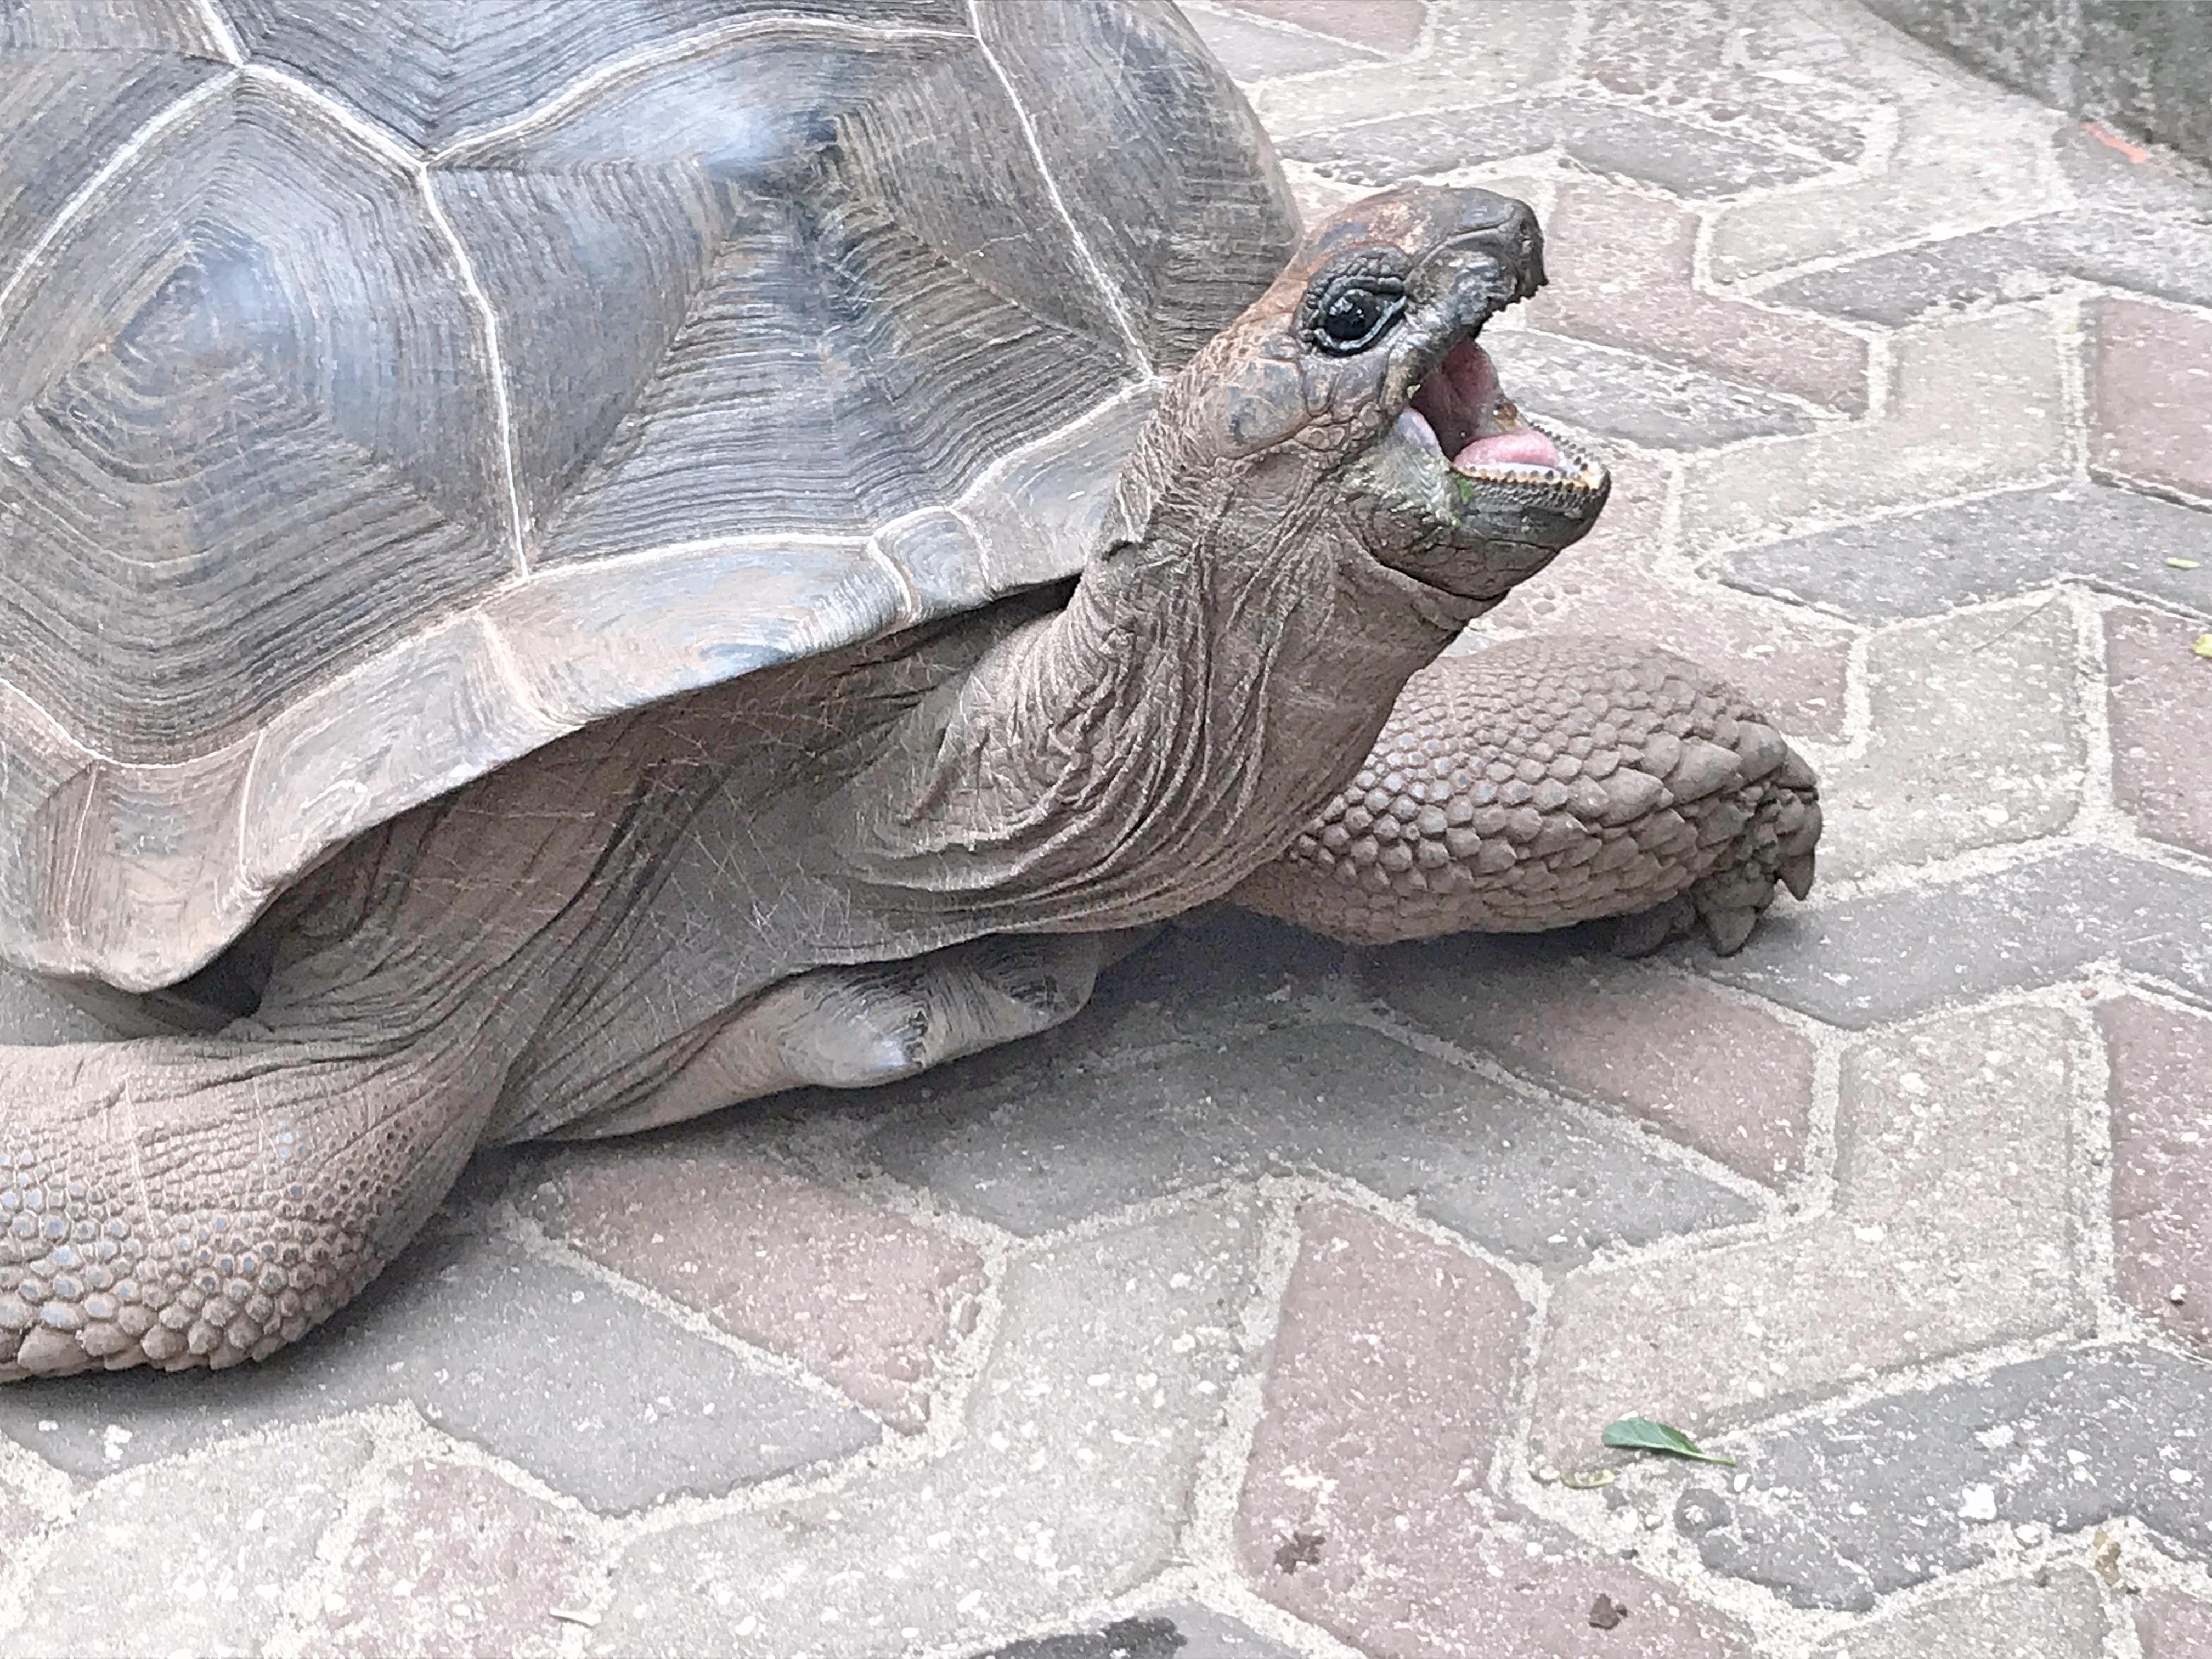 Giant tortoise Prison Island